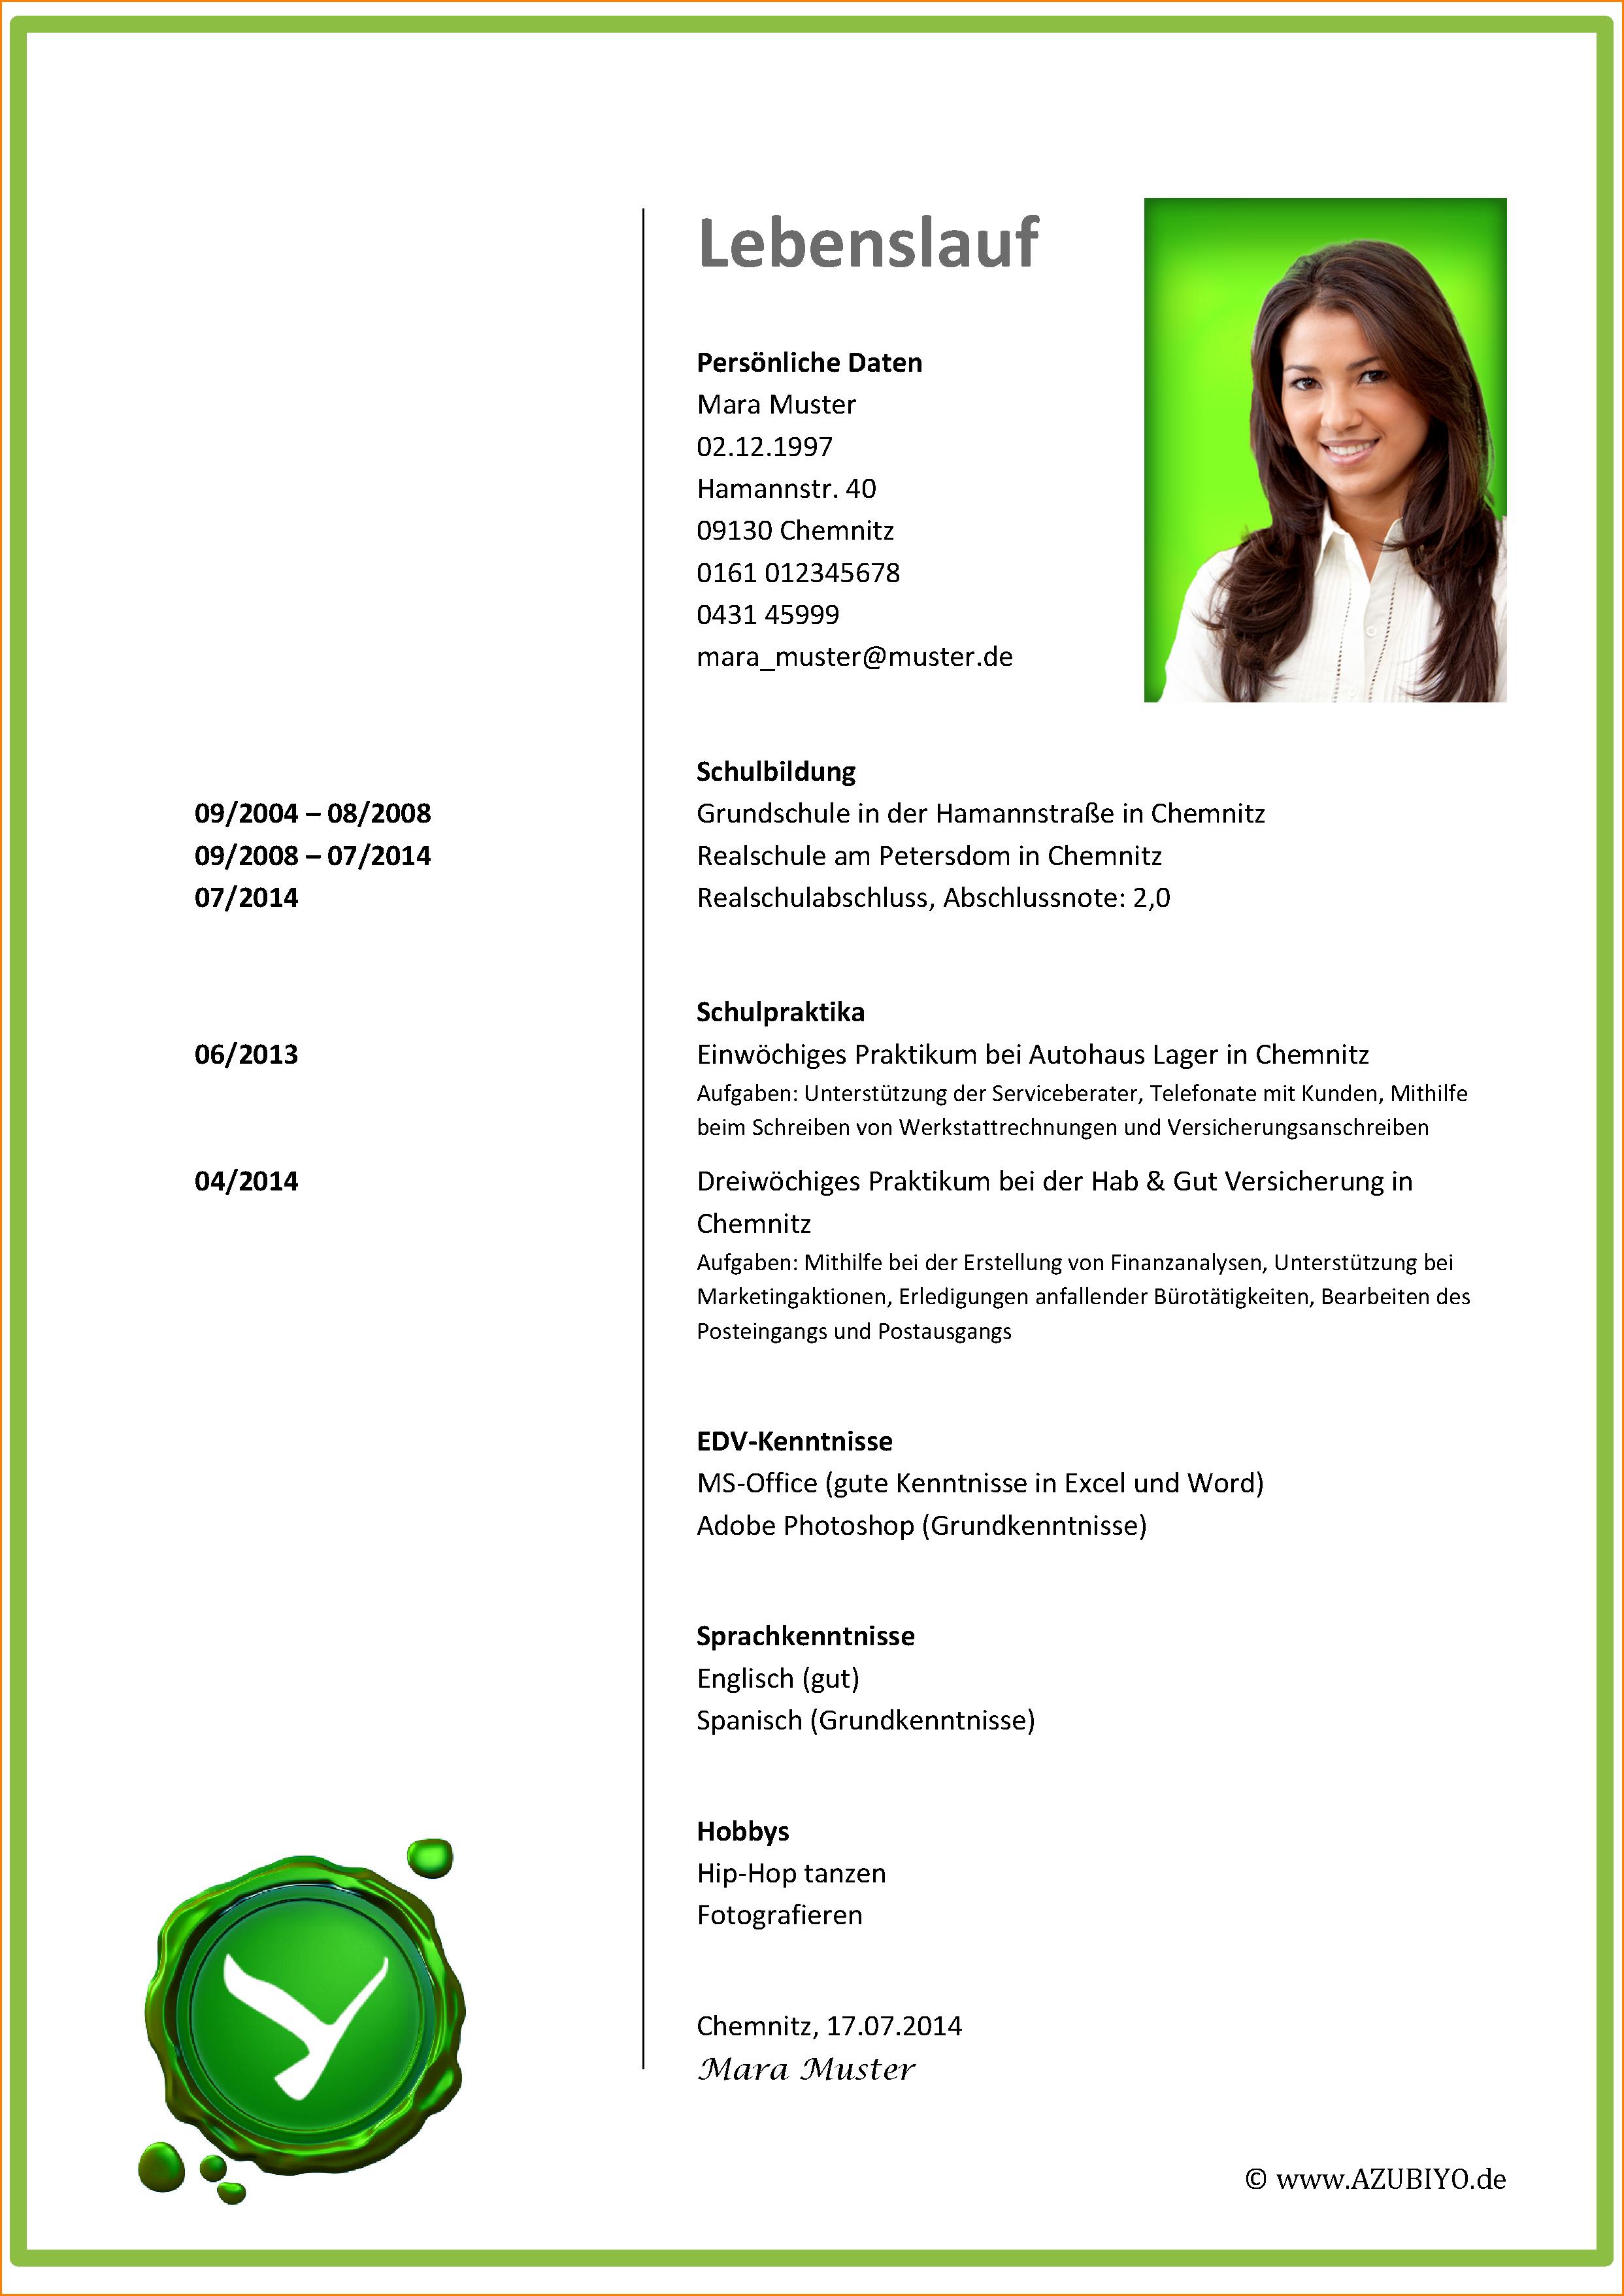 9 Muster Lebenslauf 2016 Reimbursement Format Lebenslauf 2016 Document Templates Resume Words Functional Resume